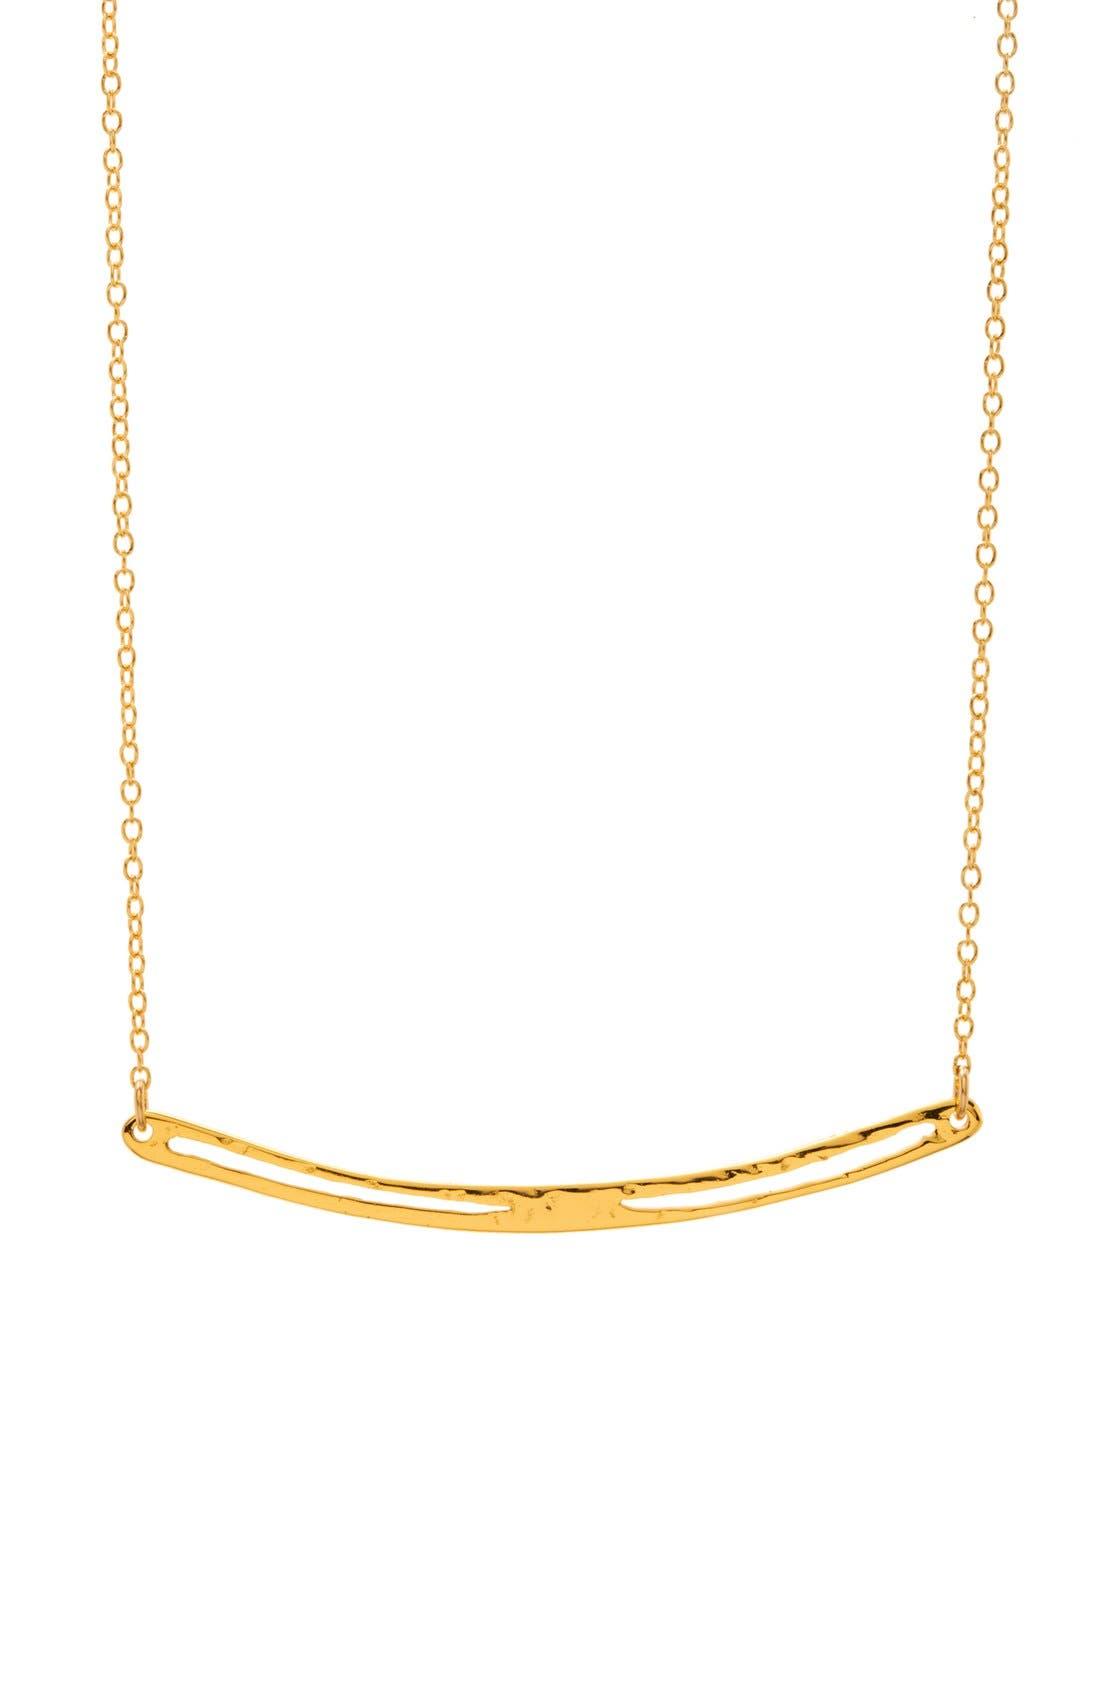 Main Image - gorjana 'Taner' Split Bar Pendant Necklace